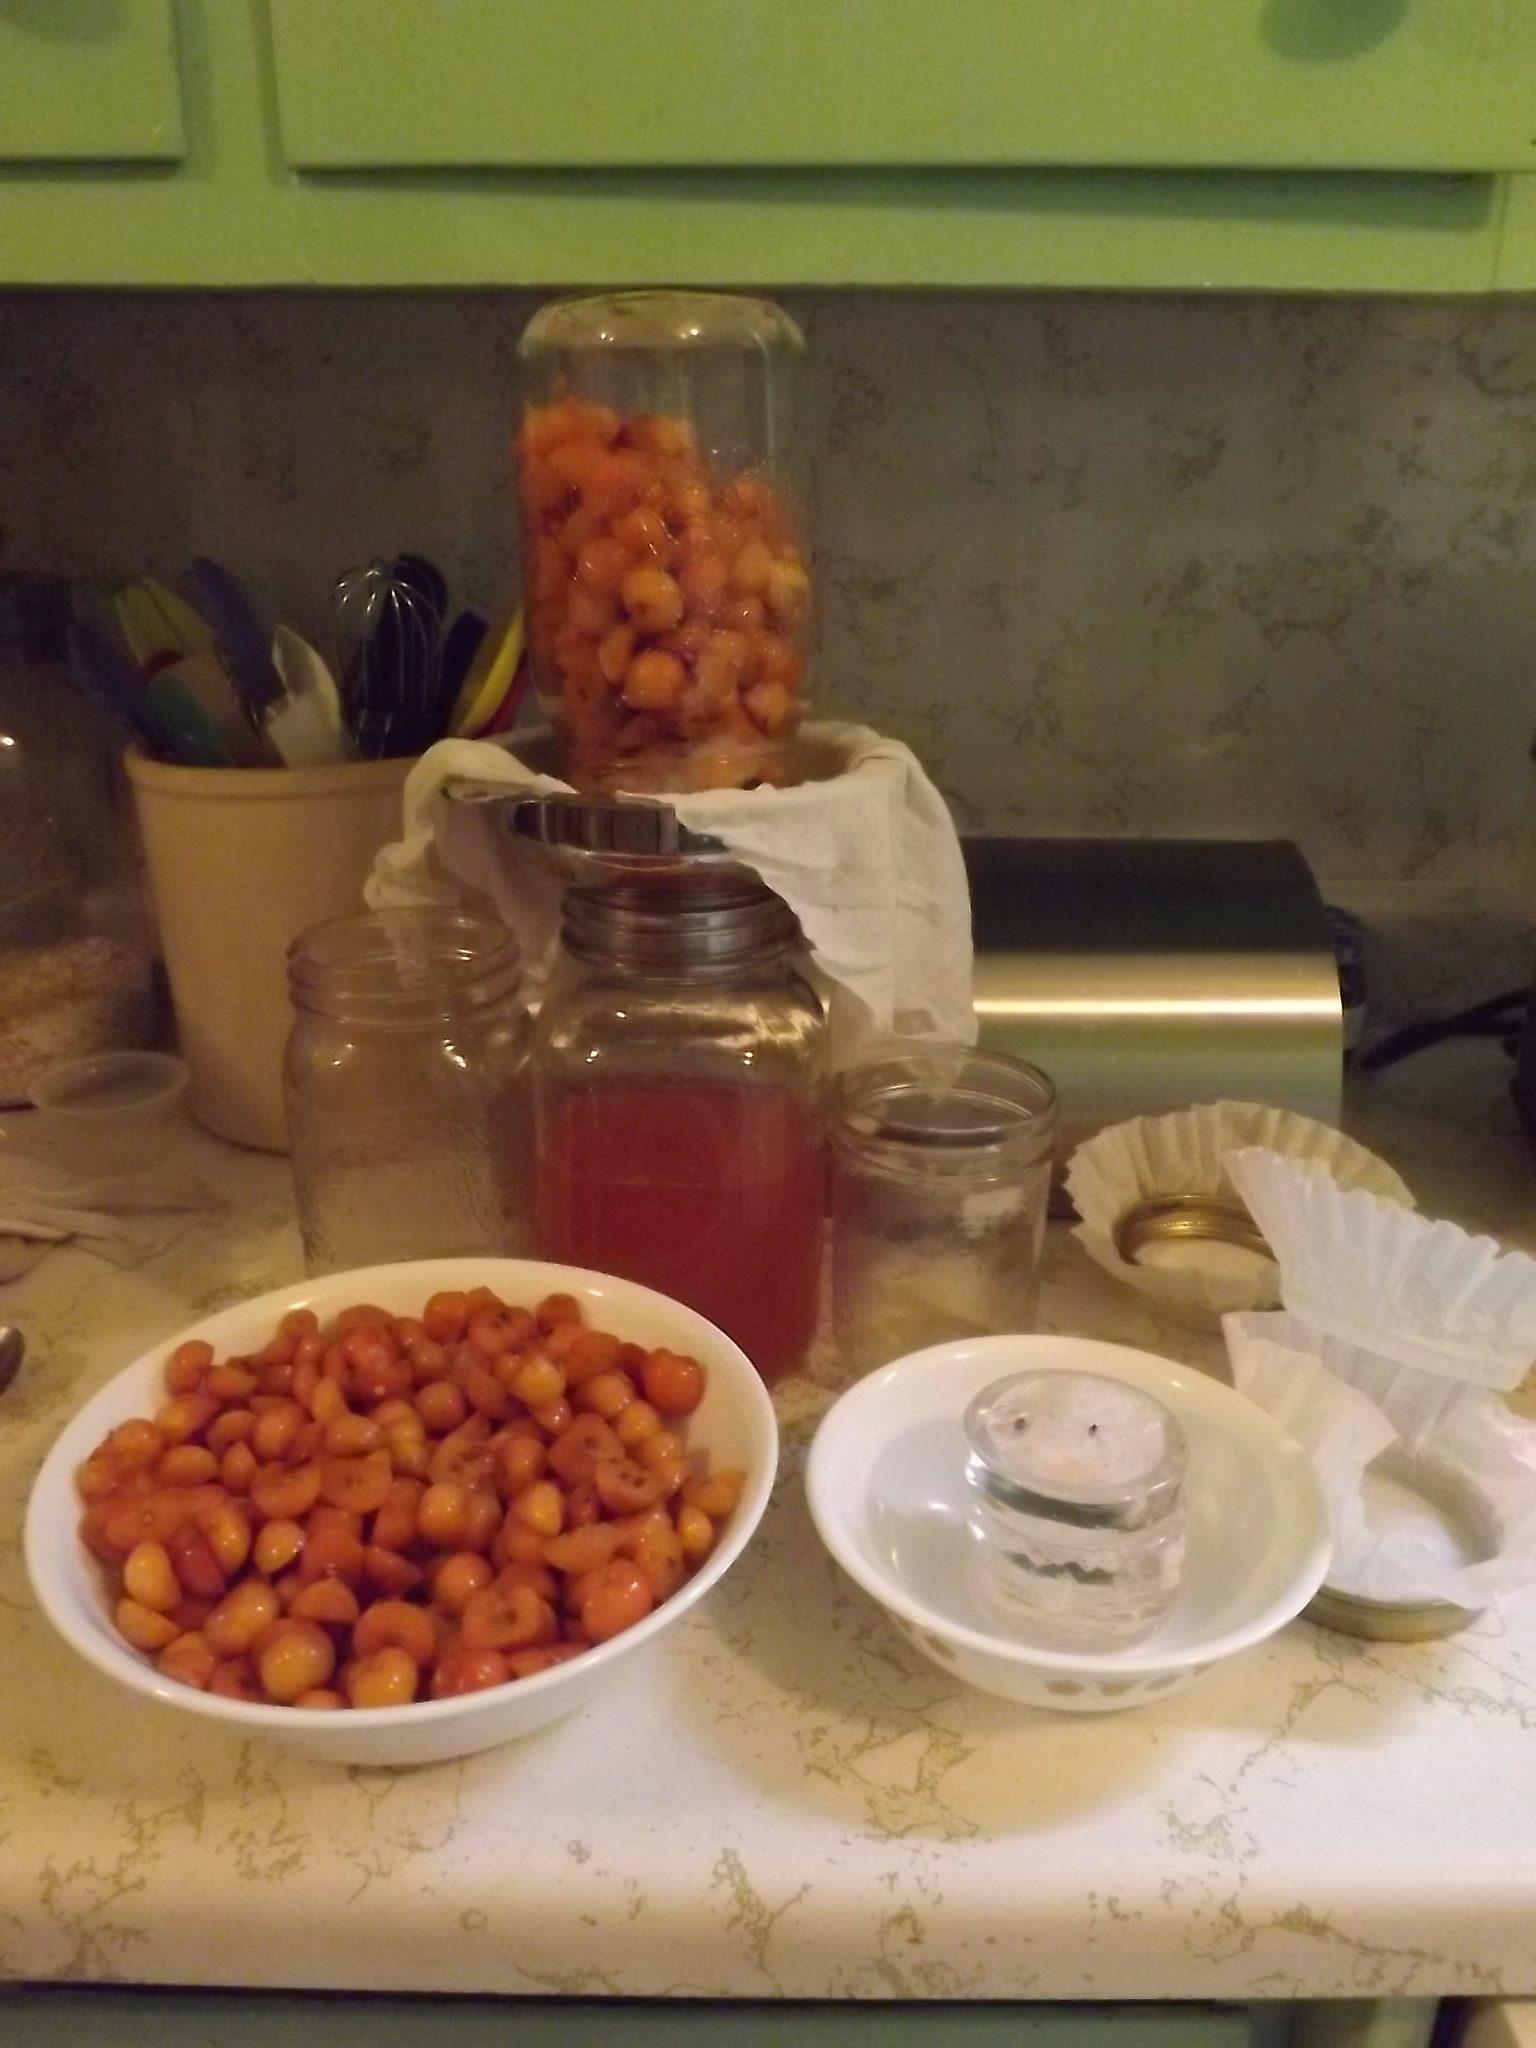 Straining the hard apple cider into a large mason jar.